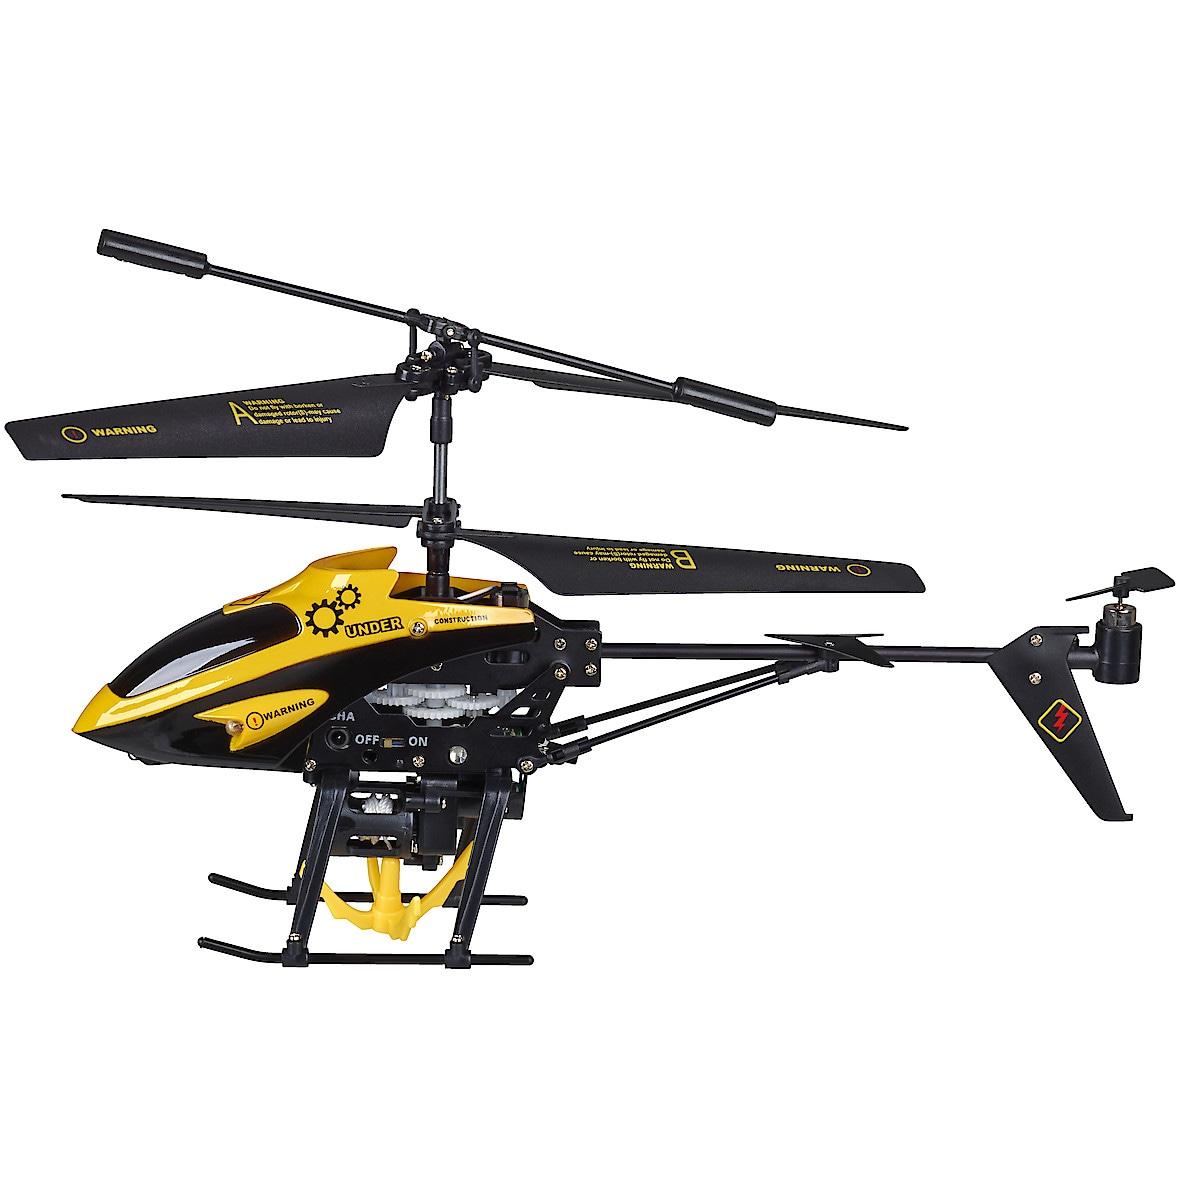 IR-styrd helikopter med vinsch